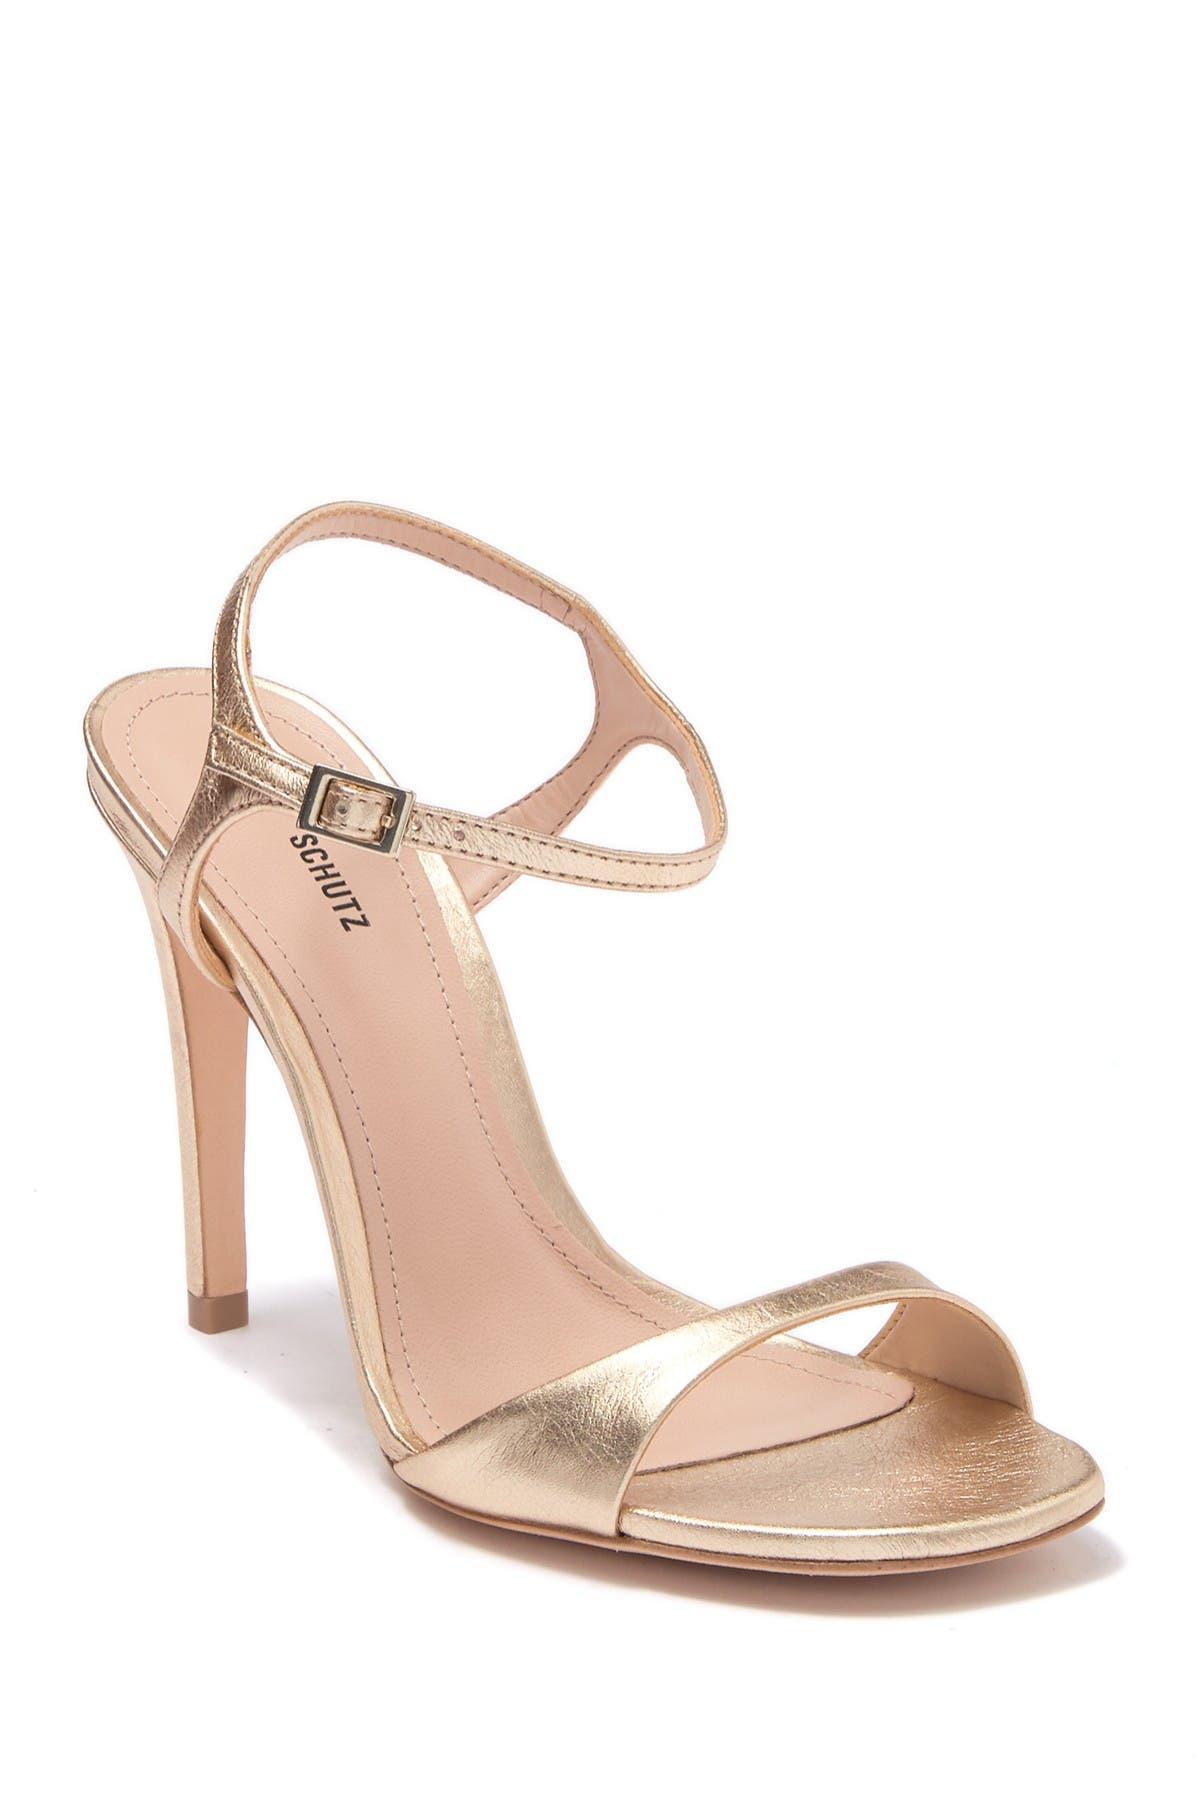 Image of Schutz Jade Heeled Sandal